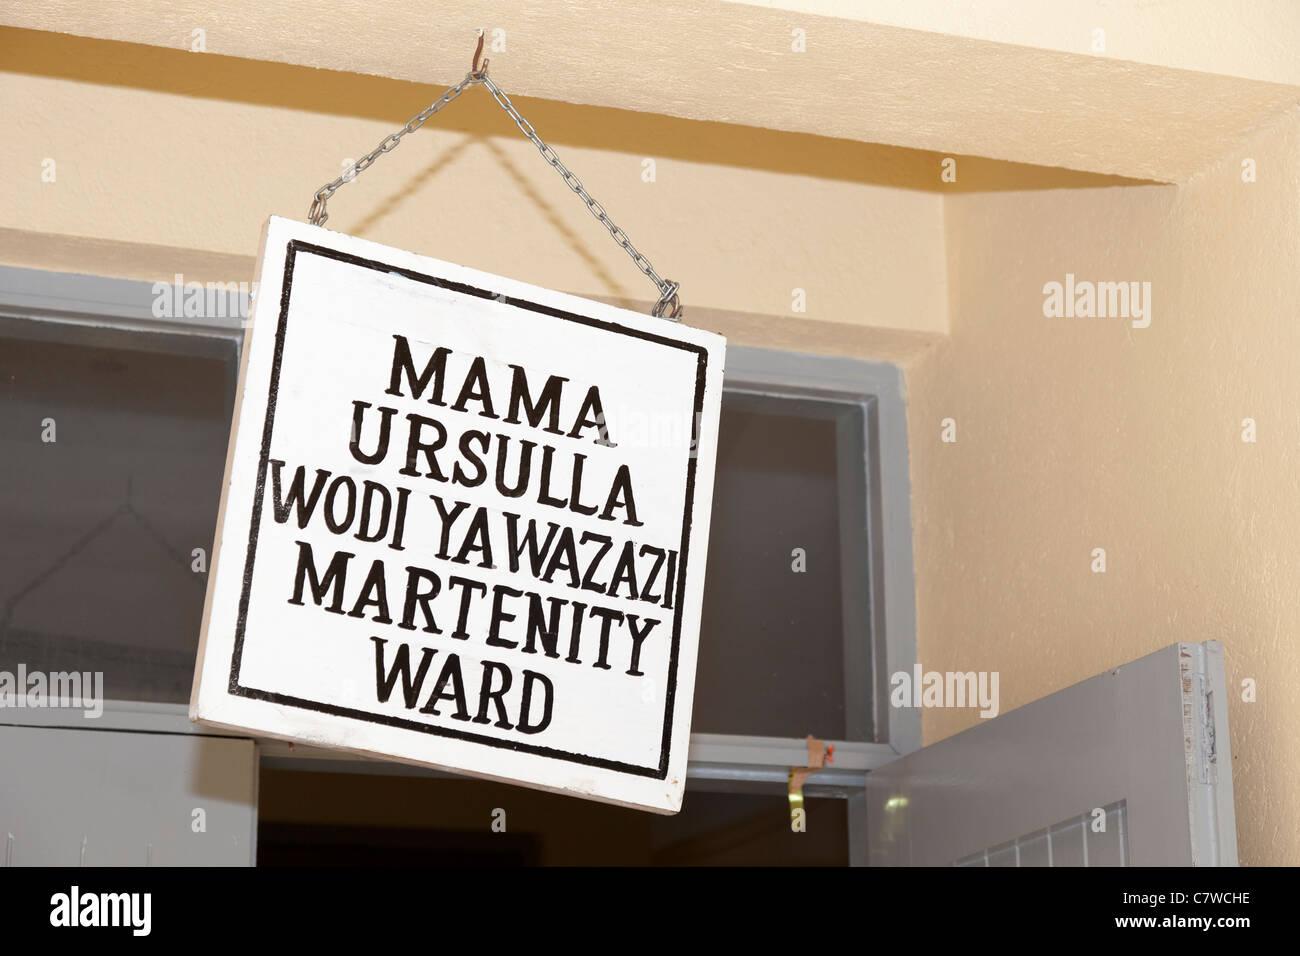 Sign for the 'Mama Ursulla Wodi Yawazazi Maternity Ward' Marangu Hospital, Moshi, Tanzania - Stock Image